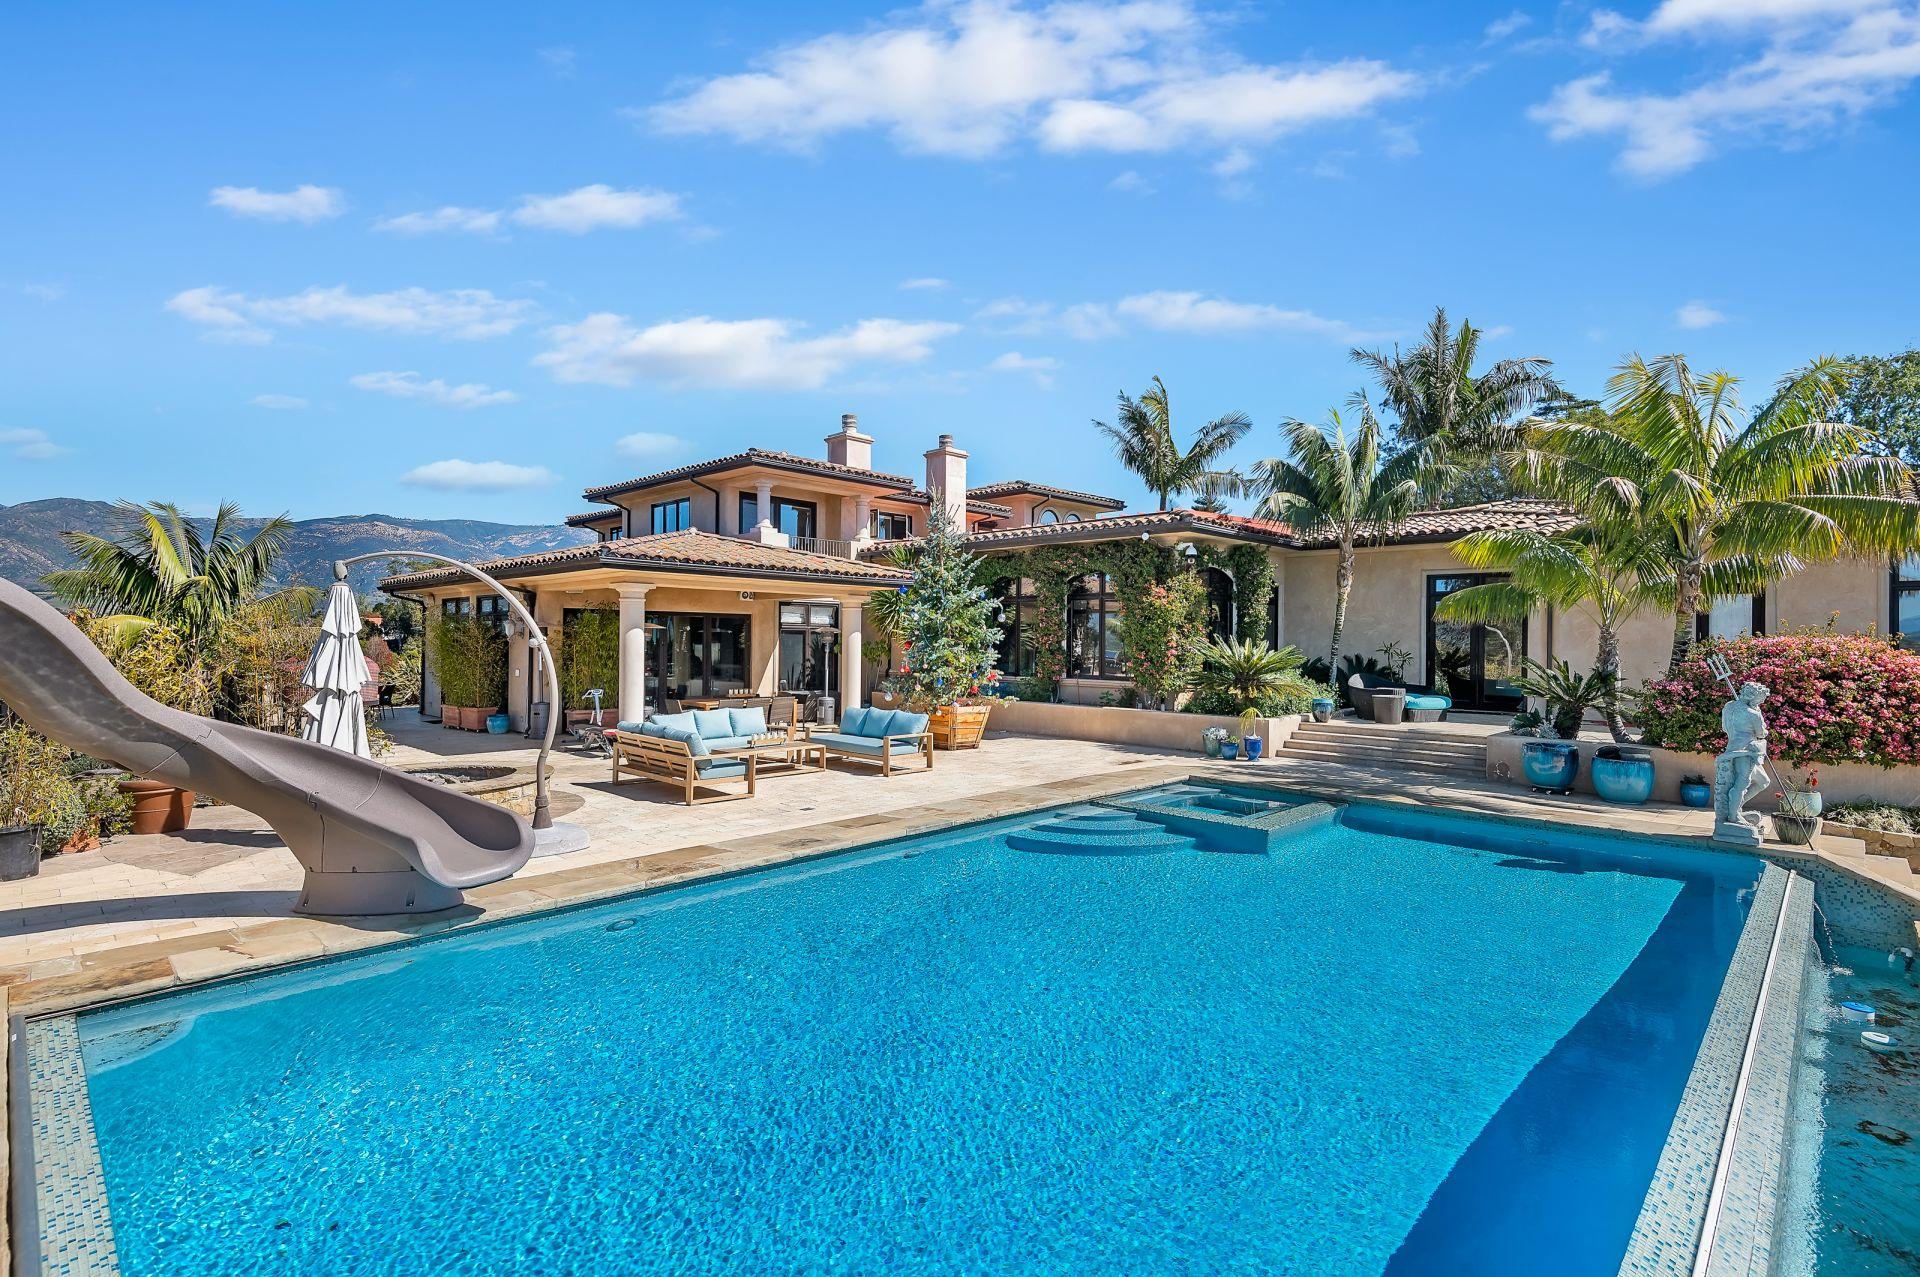 Luxury Santa Barbara Estate For Lease 4/21-12/21